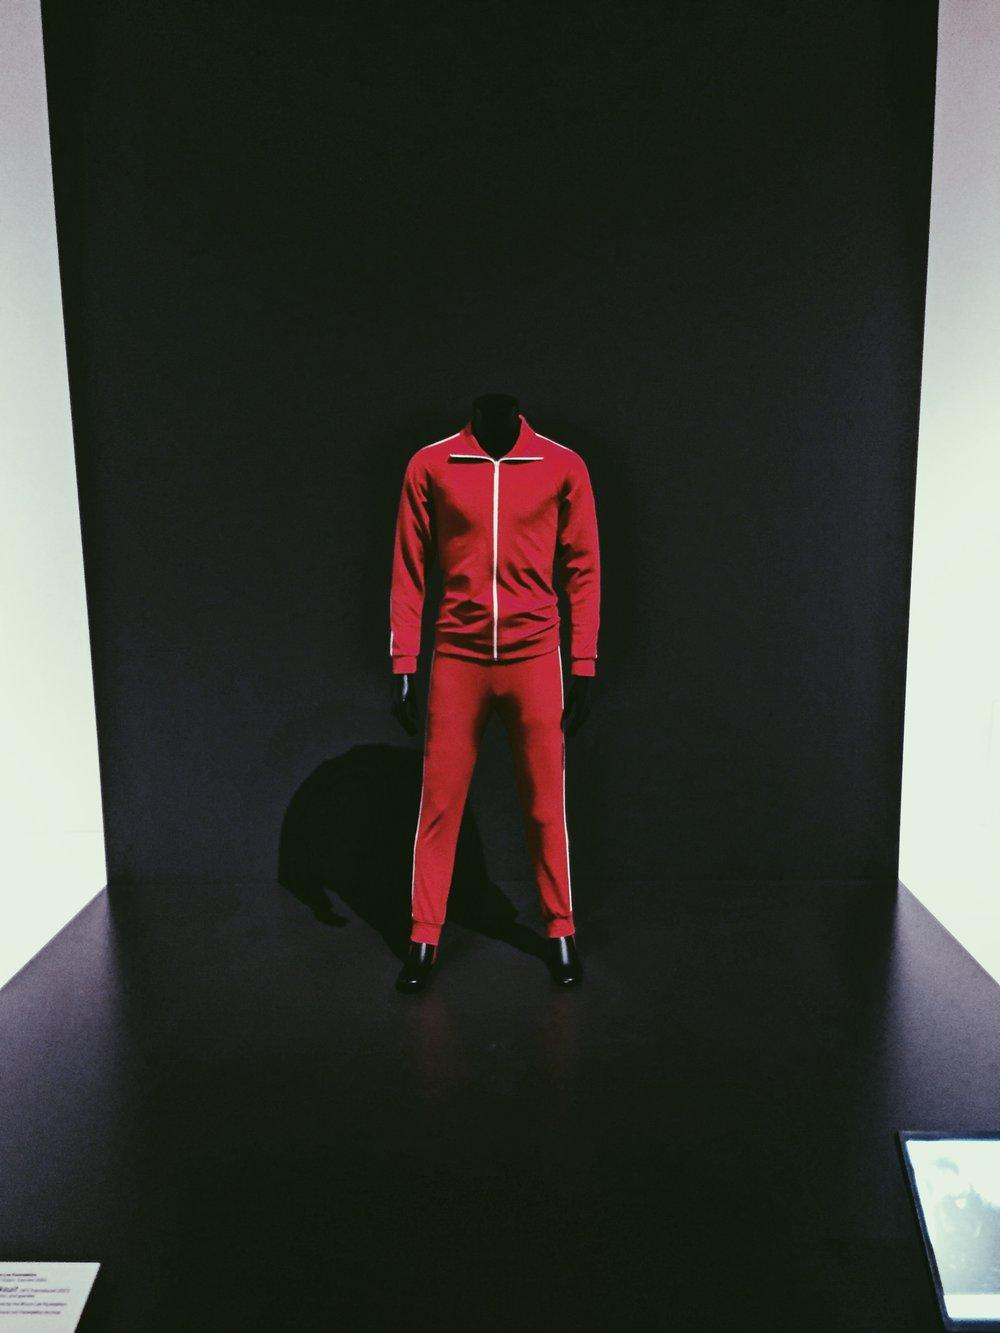 The sweat suit